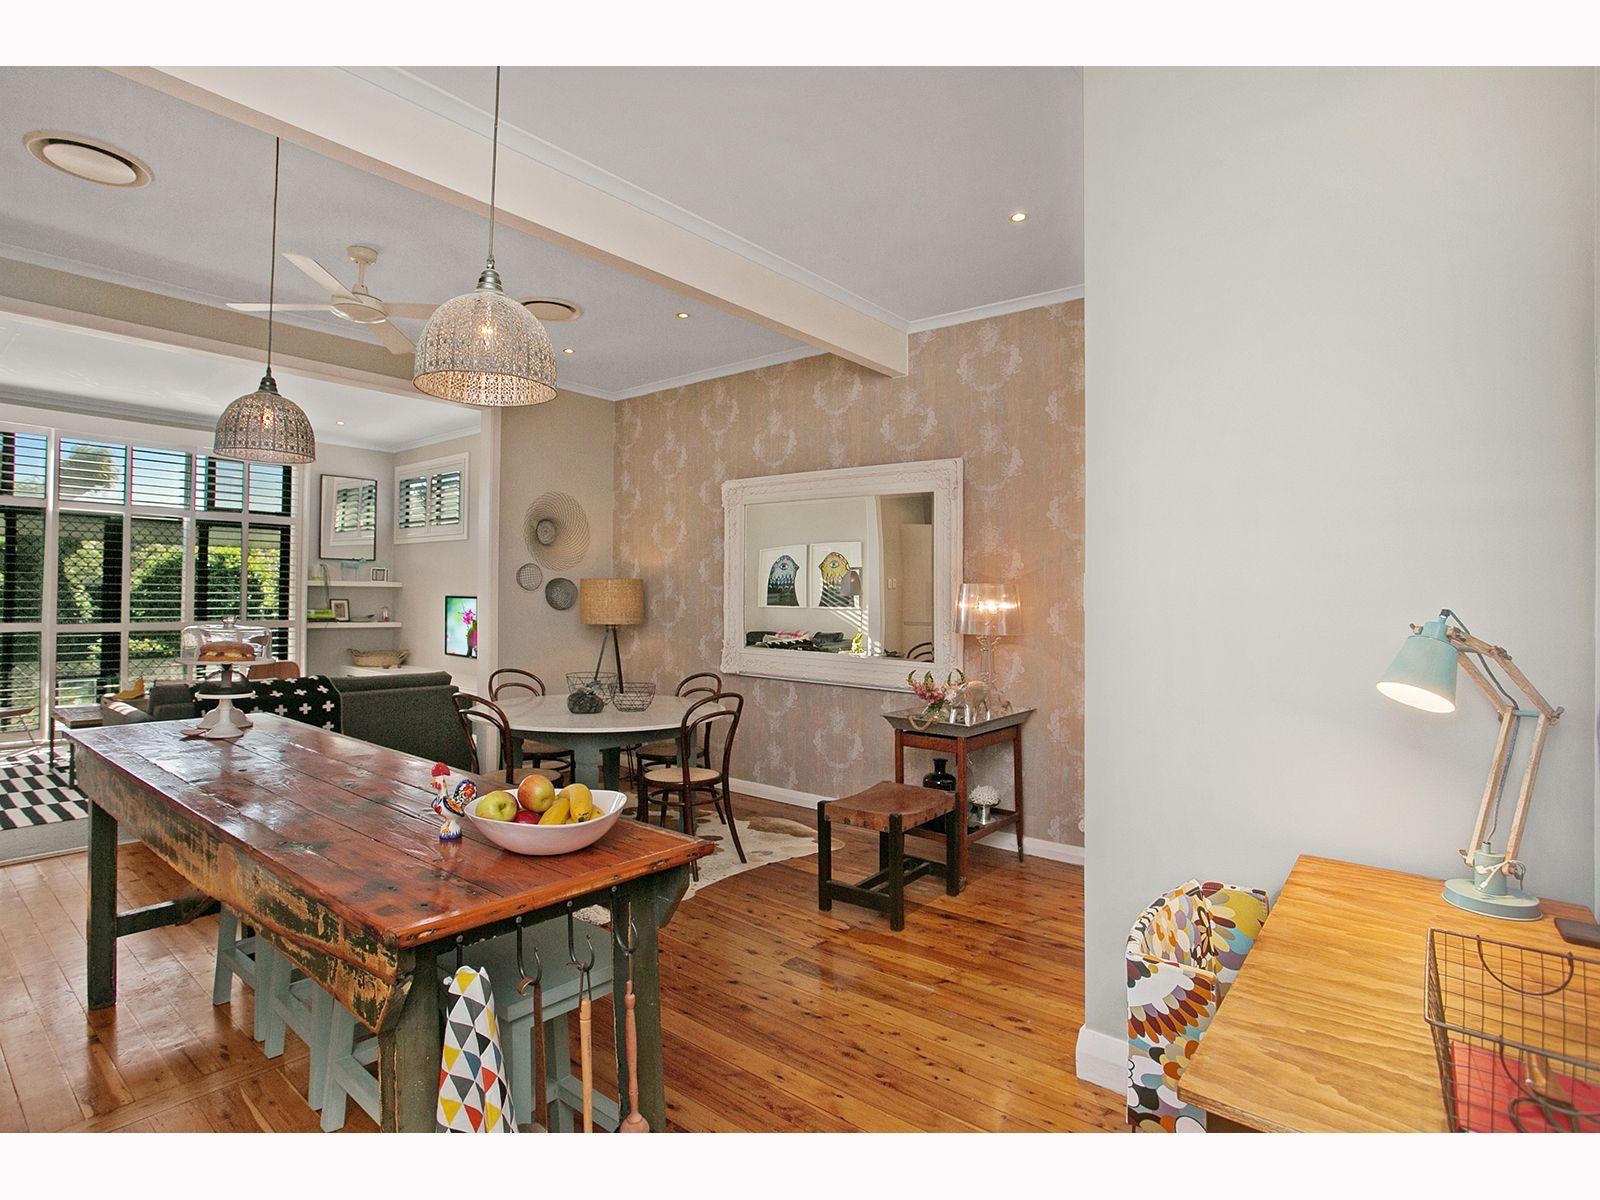 23 Dixon Street, HAMILTON NSW 2303 Home, Home decor